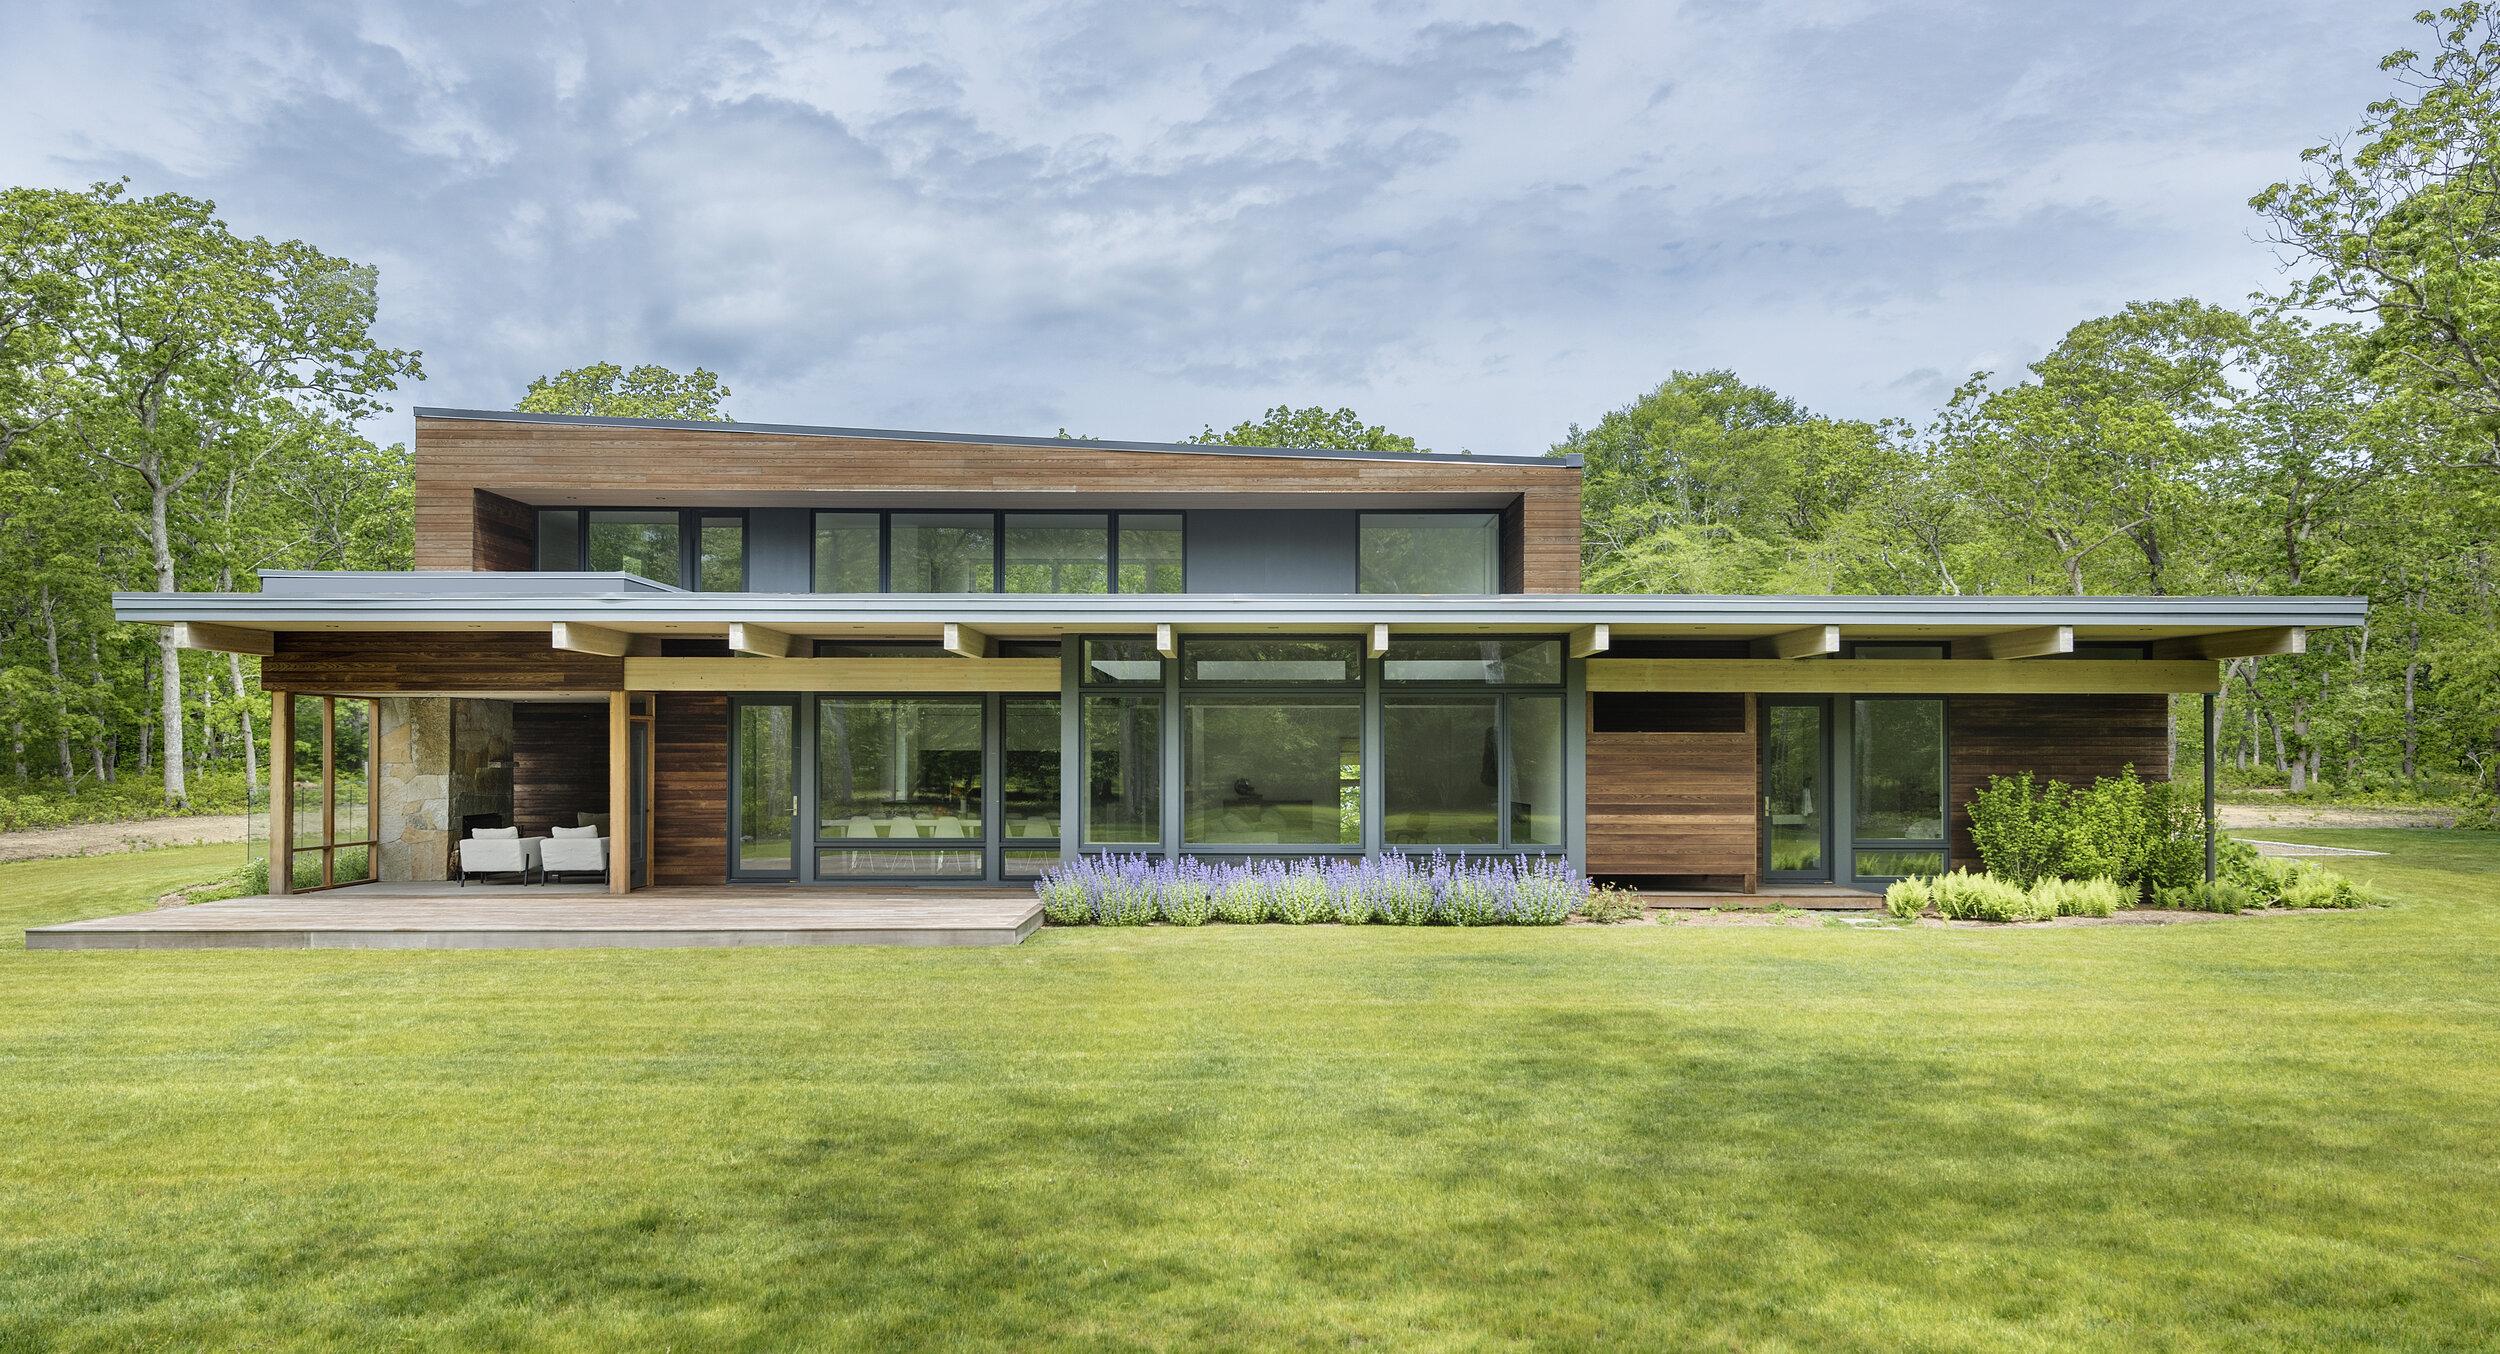 turkel-design-prefab-houses-design-architecture-town-cove.jpg